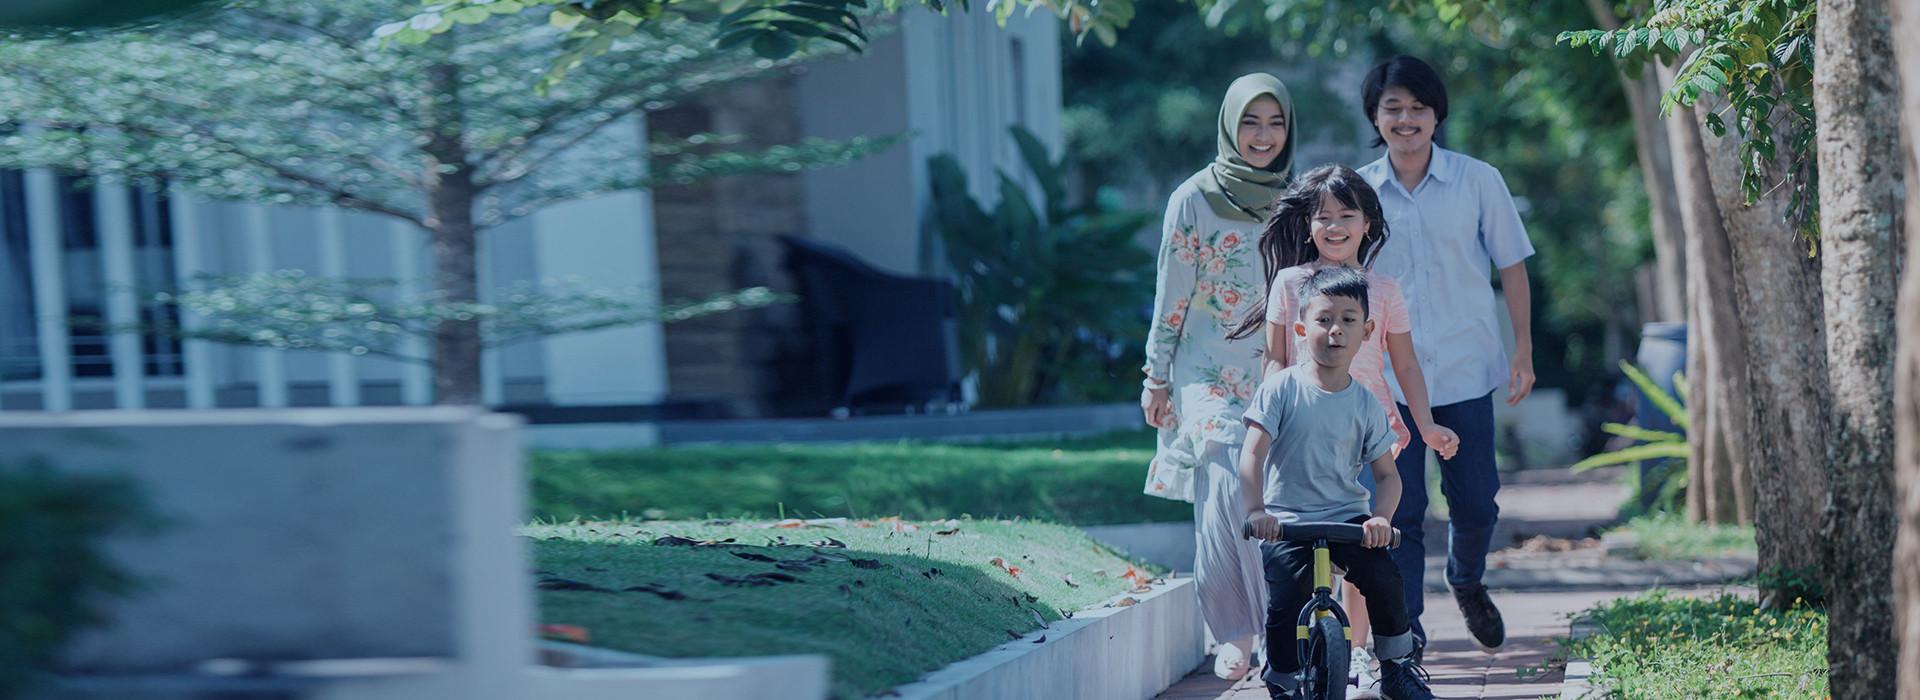 asuransi-syariah-pfi-mega-life